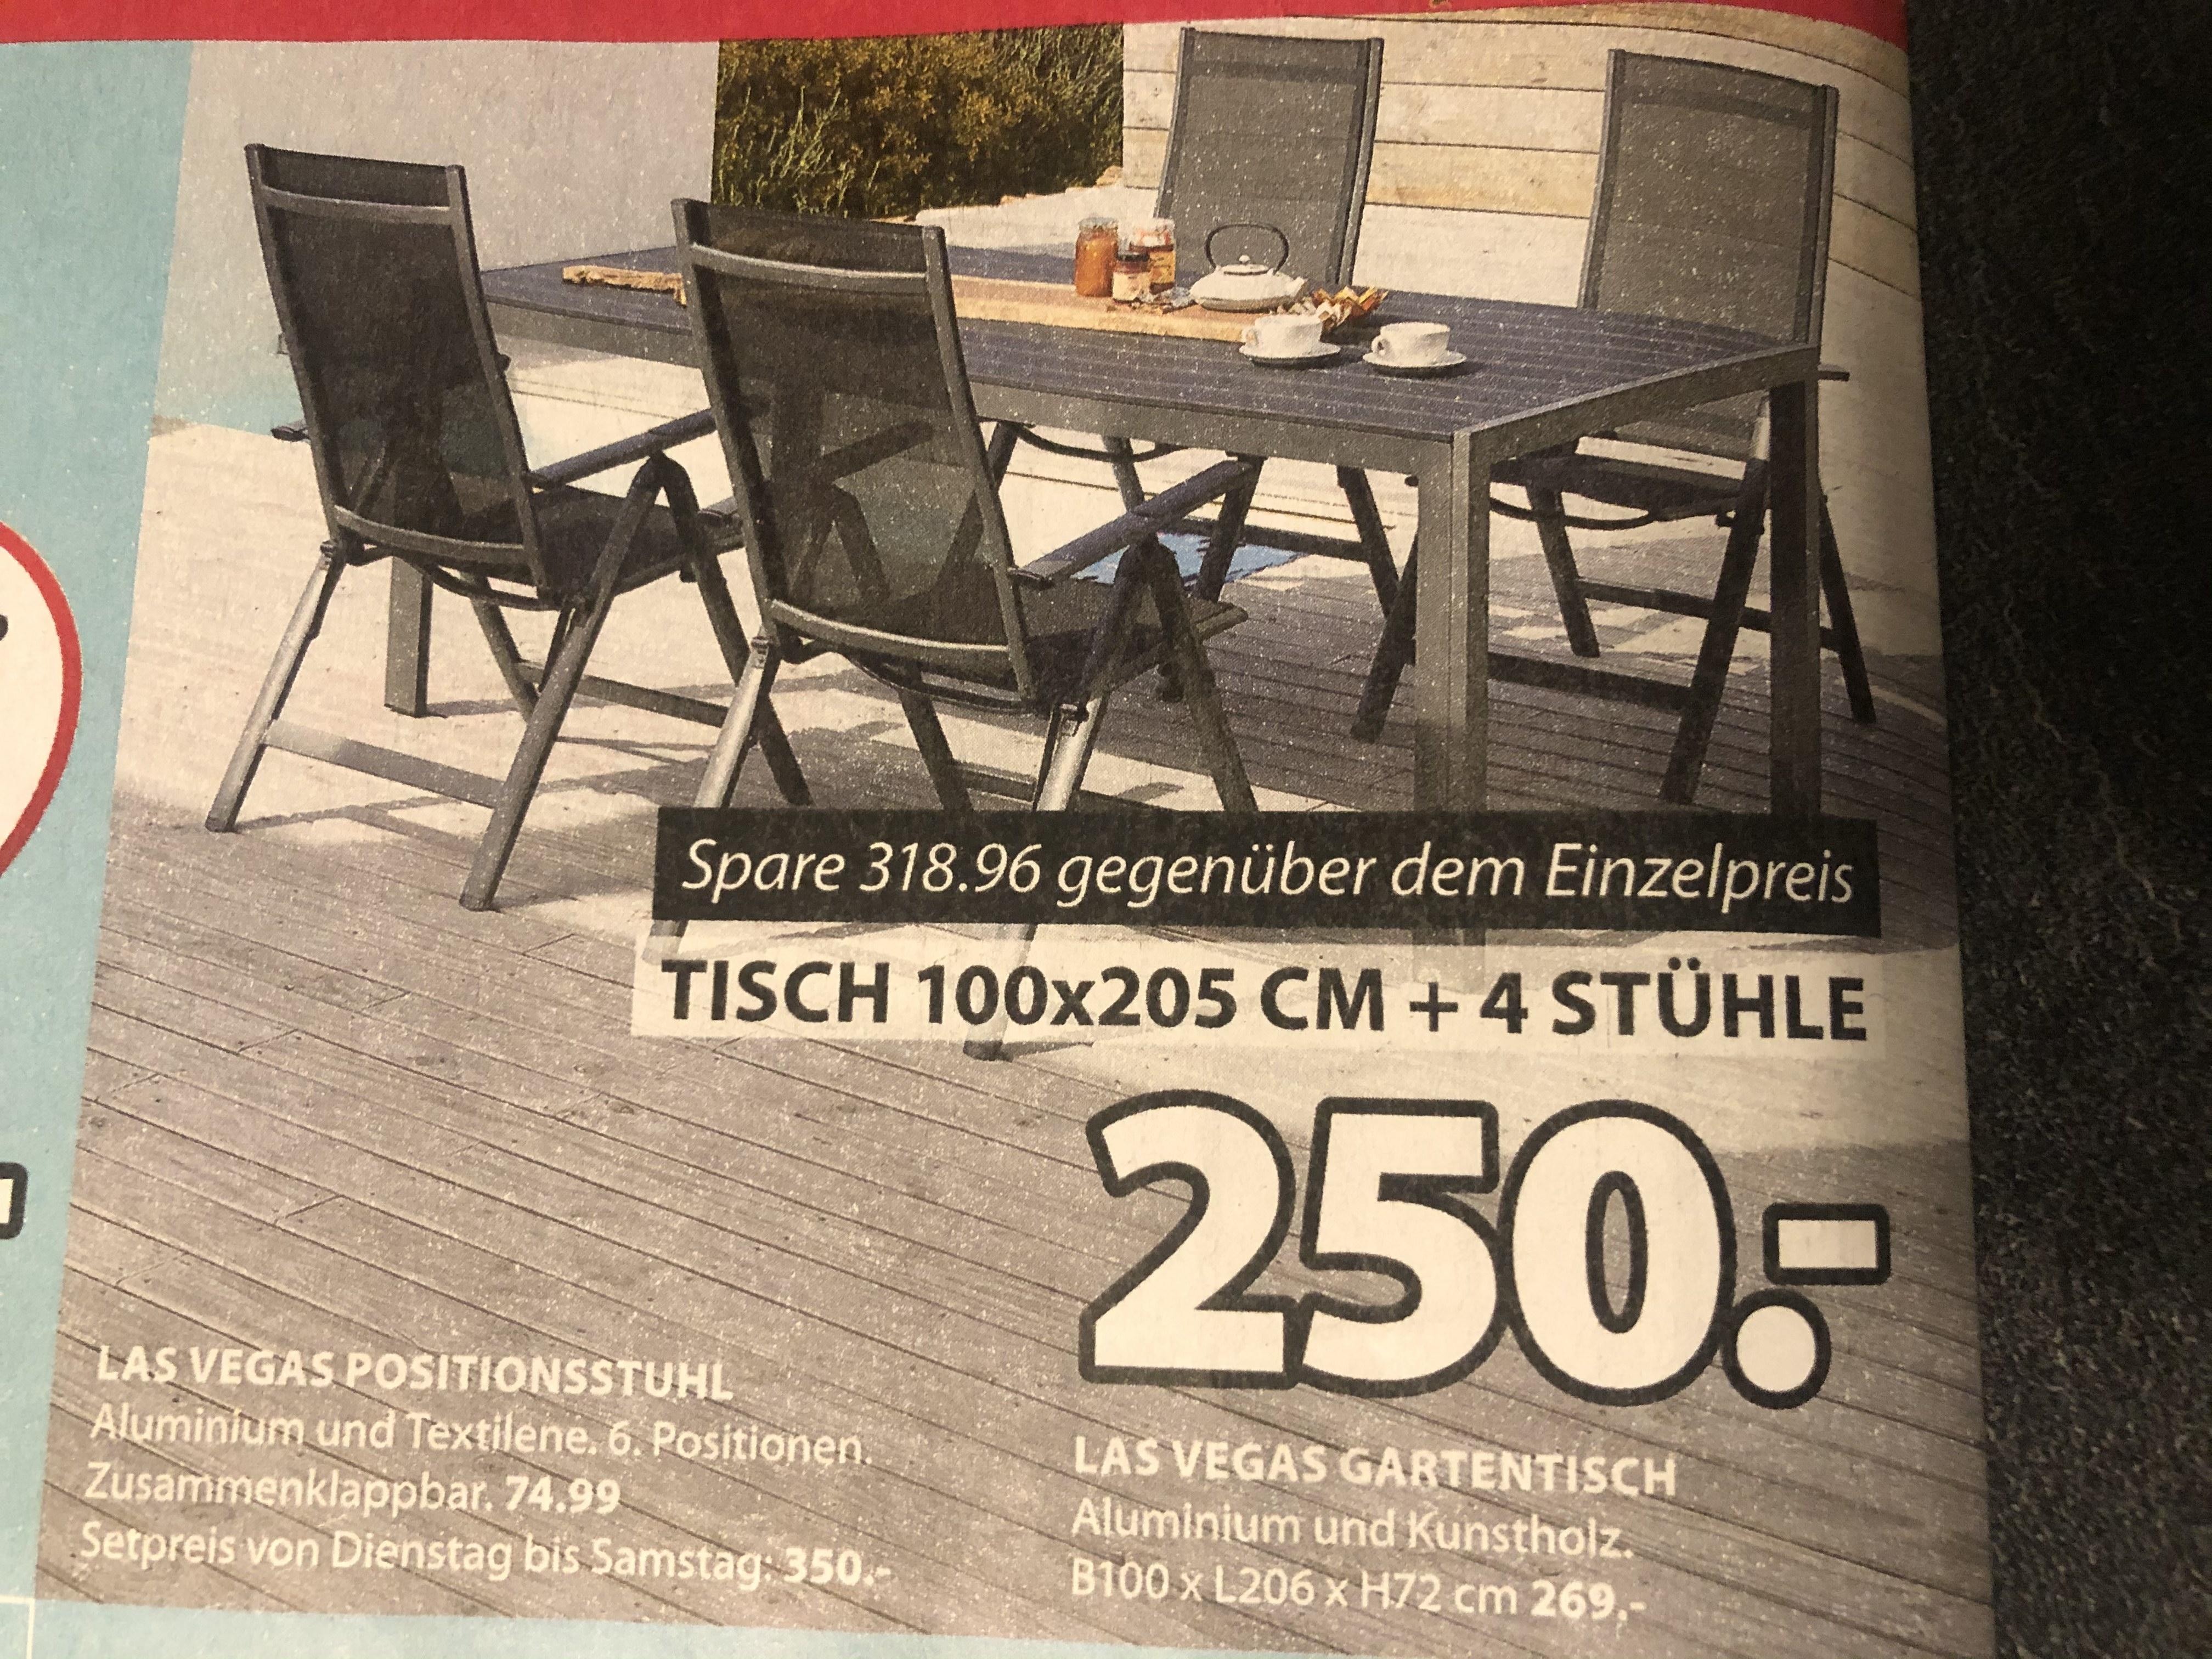 Gartenmöbel-Set LAS VEGAS (100x205, 4 Stühle)